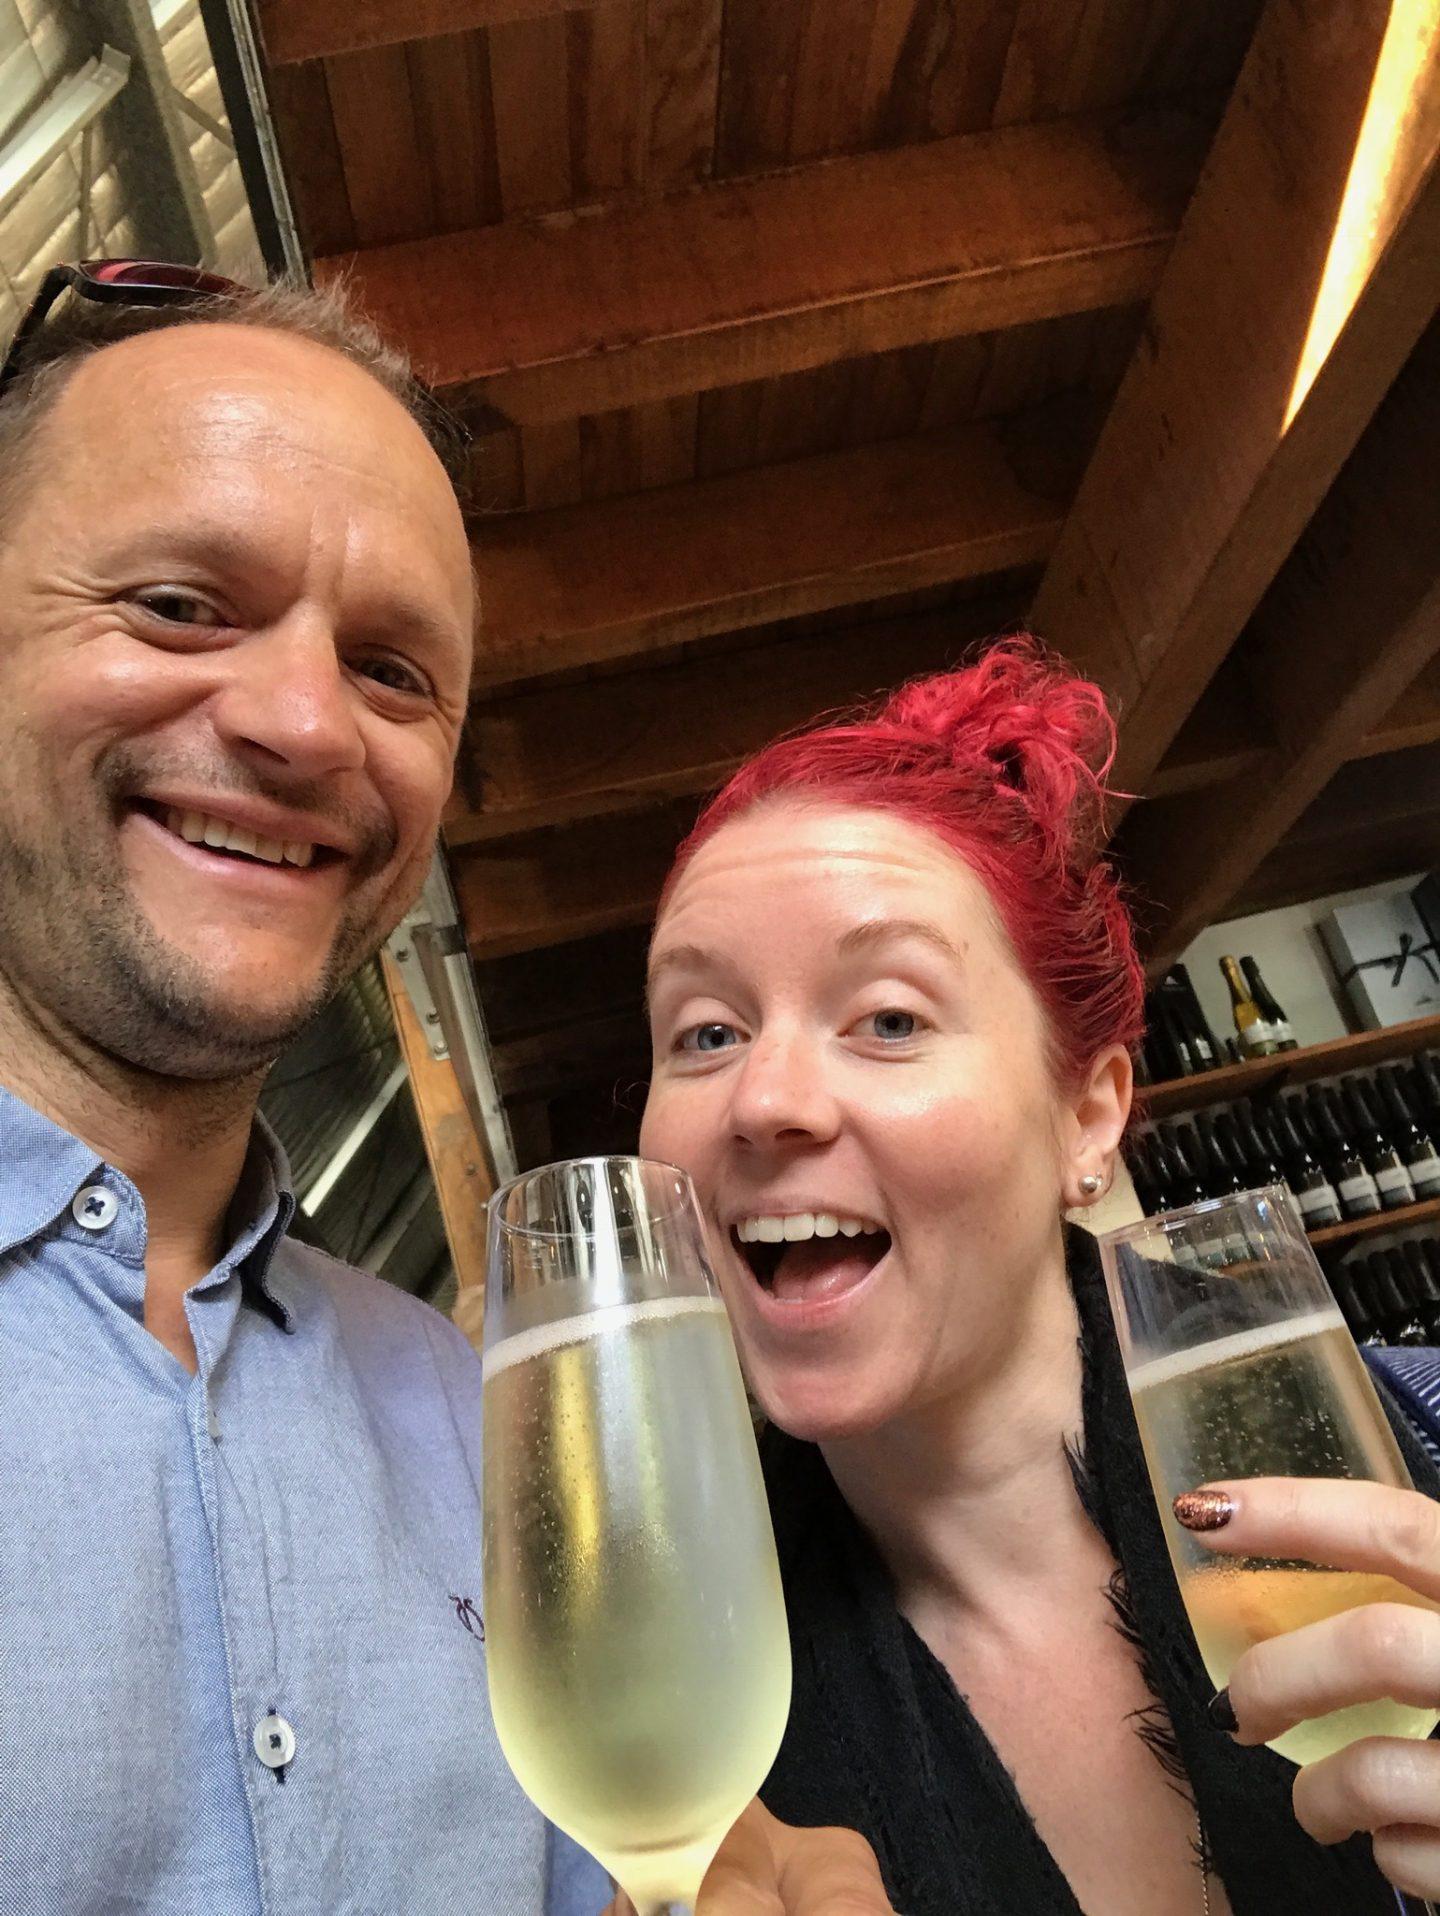 darren and deanne drinking champagne